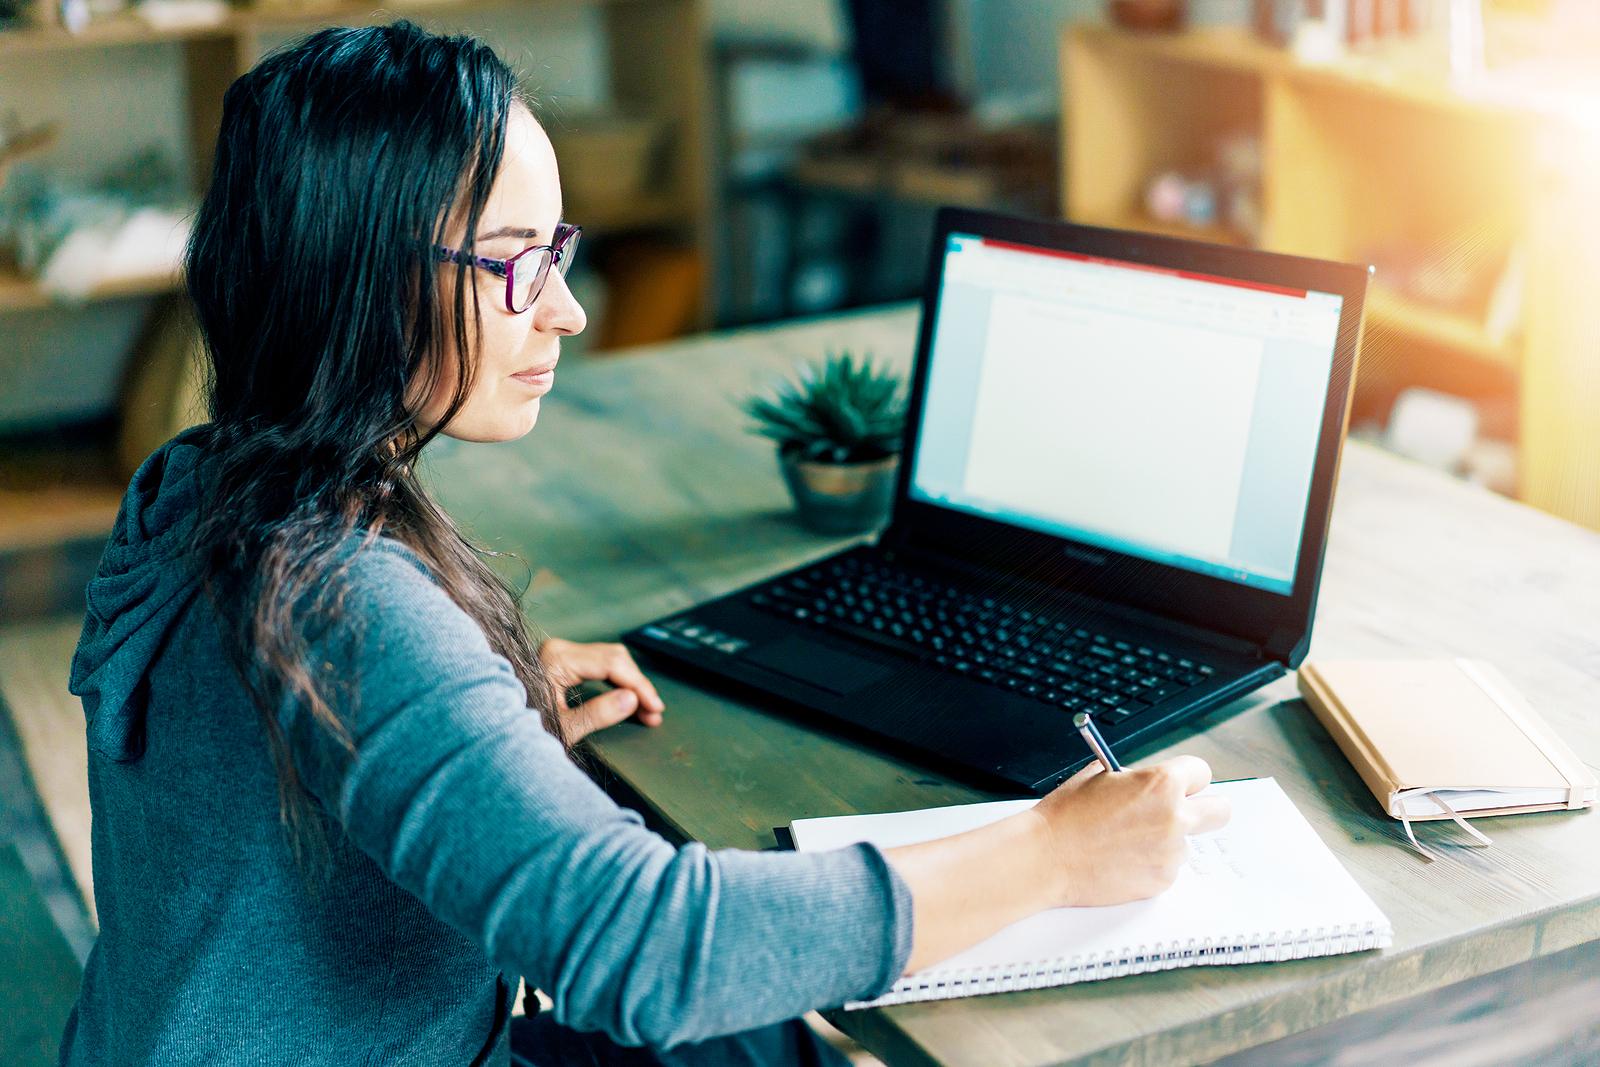 Women writing essay on laptop